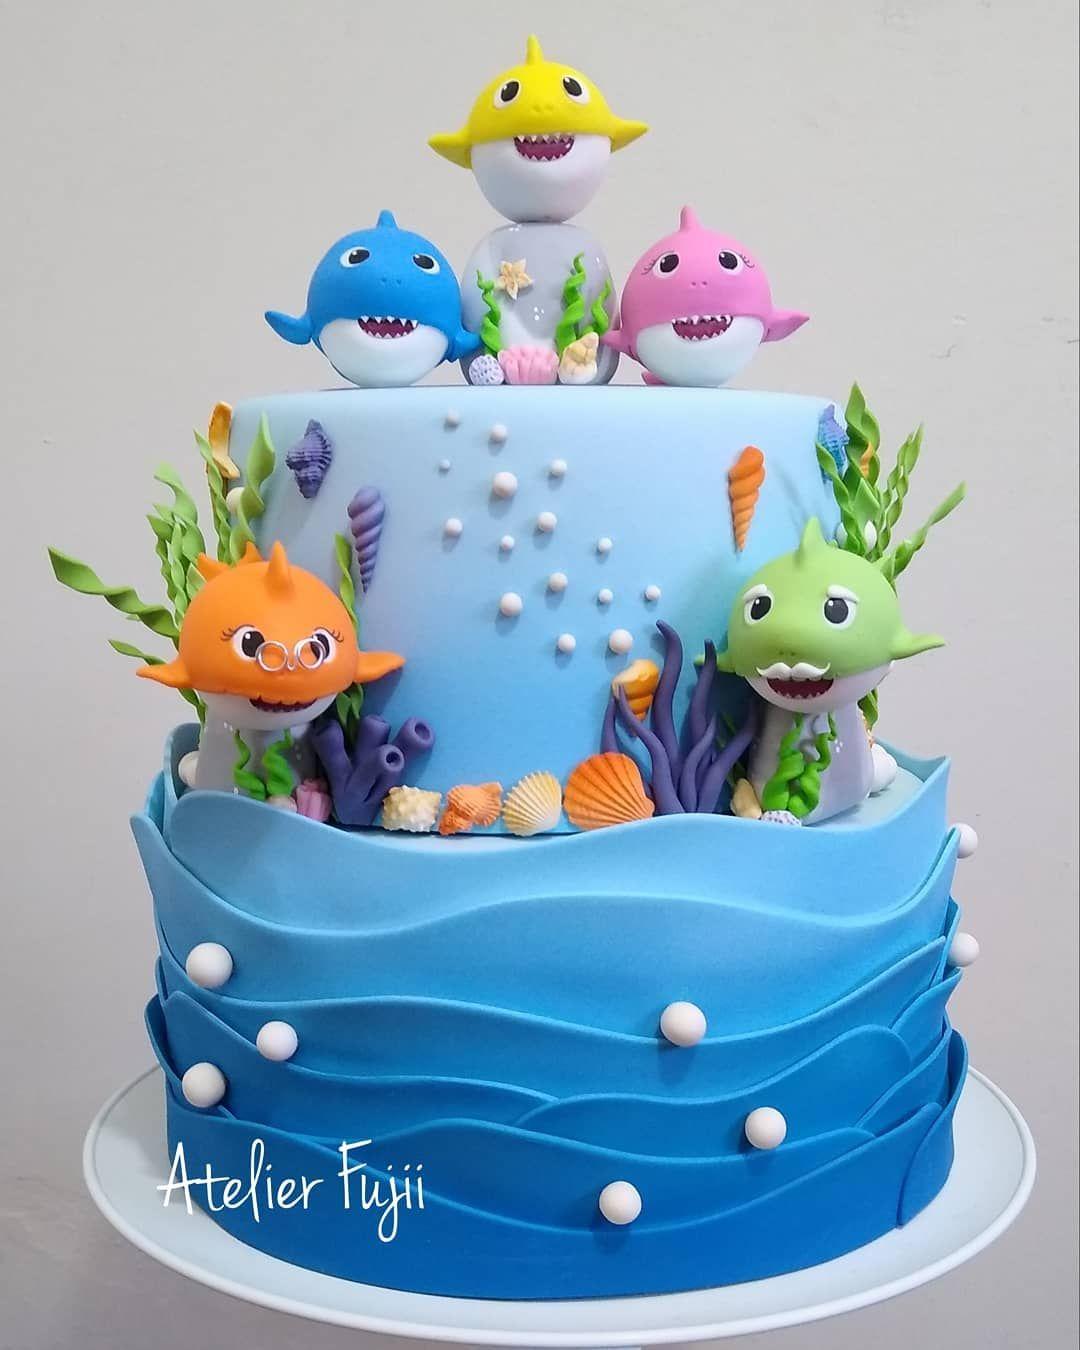 Pin by dijana zaric on Cake art by DG Cakes | Cake, Baby